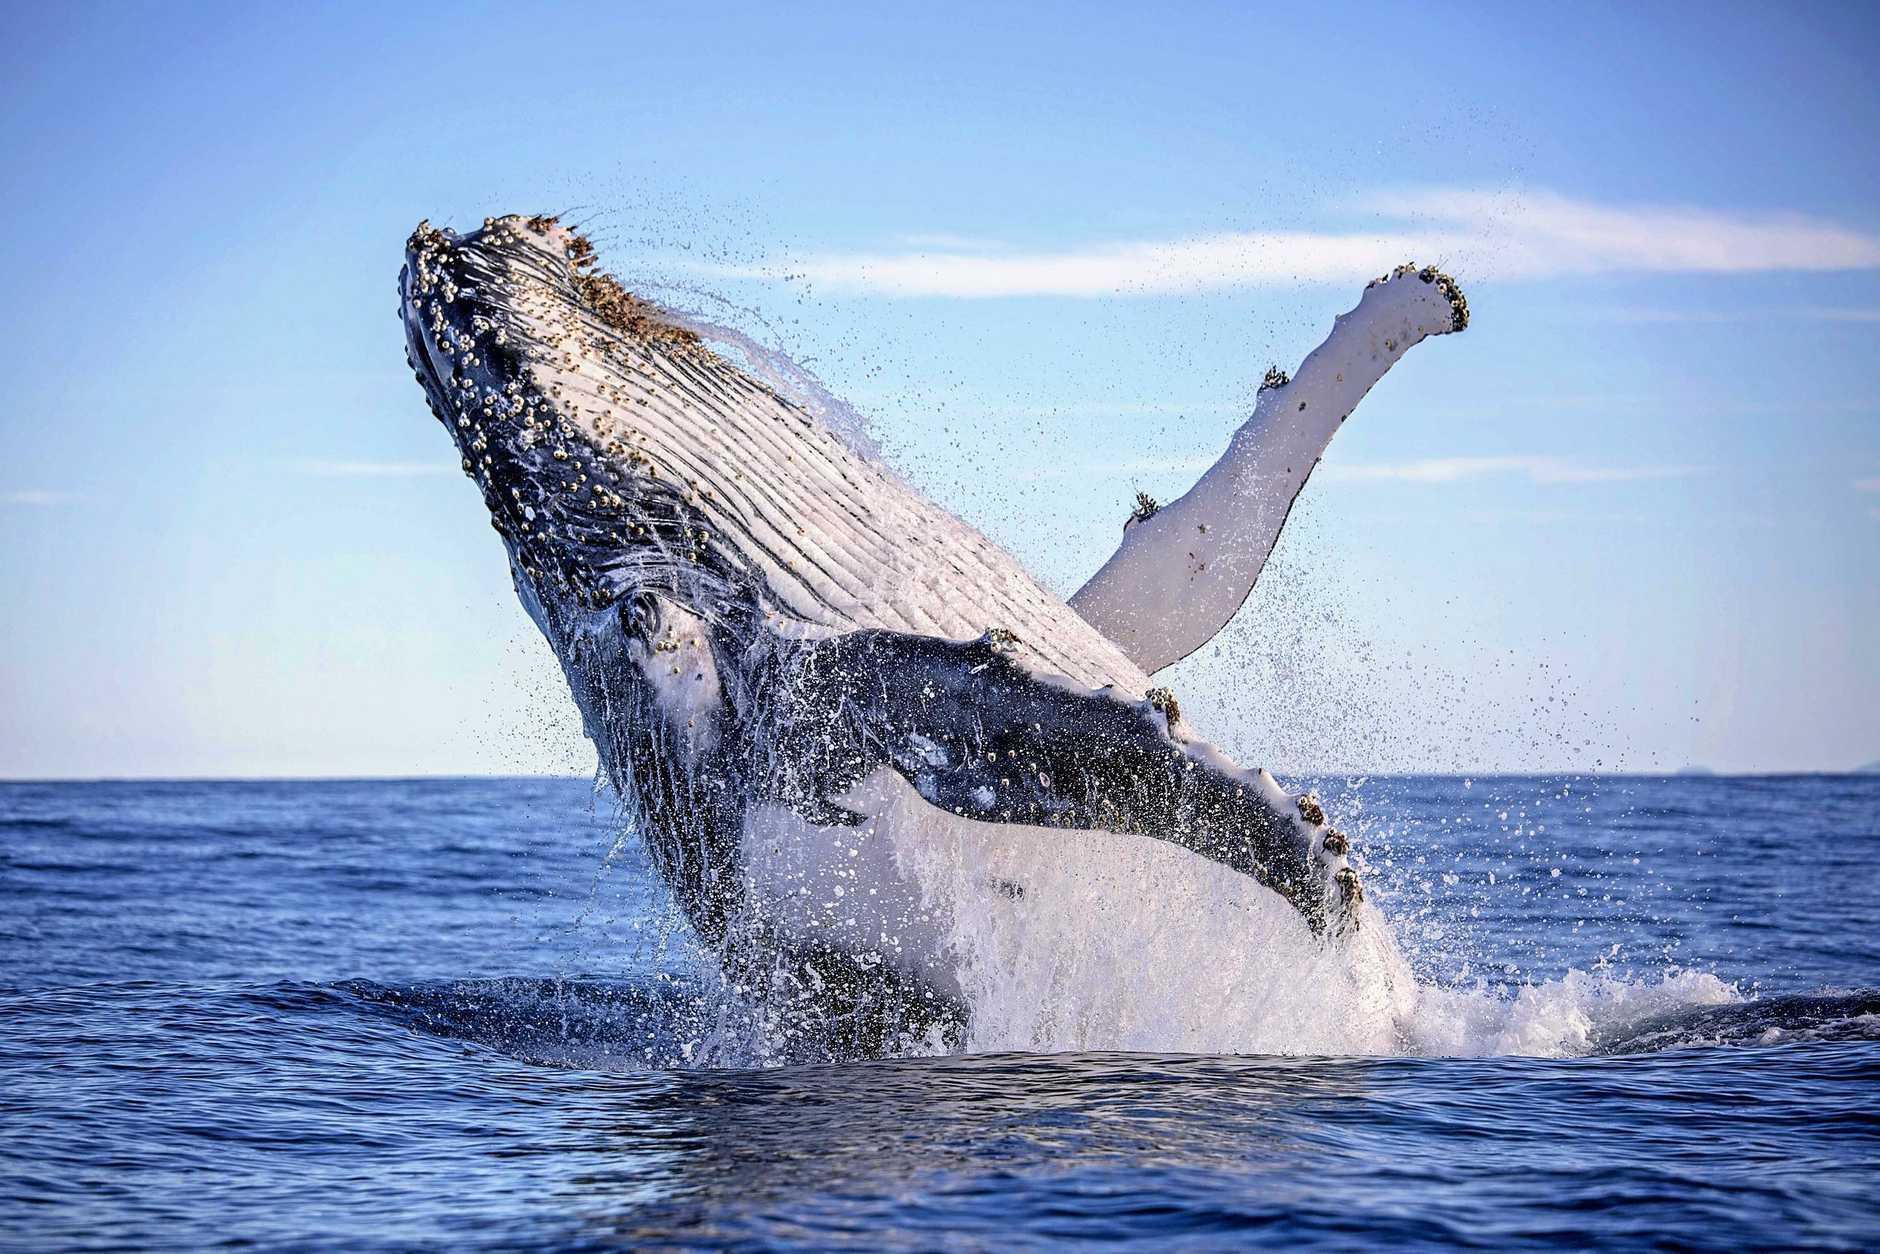 Правила наблюдения за горбатыми китами в Доминикане